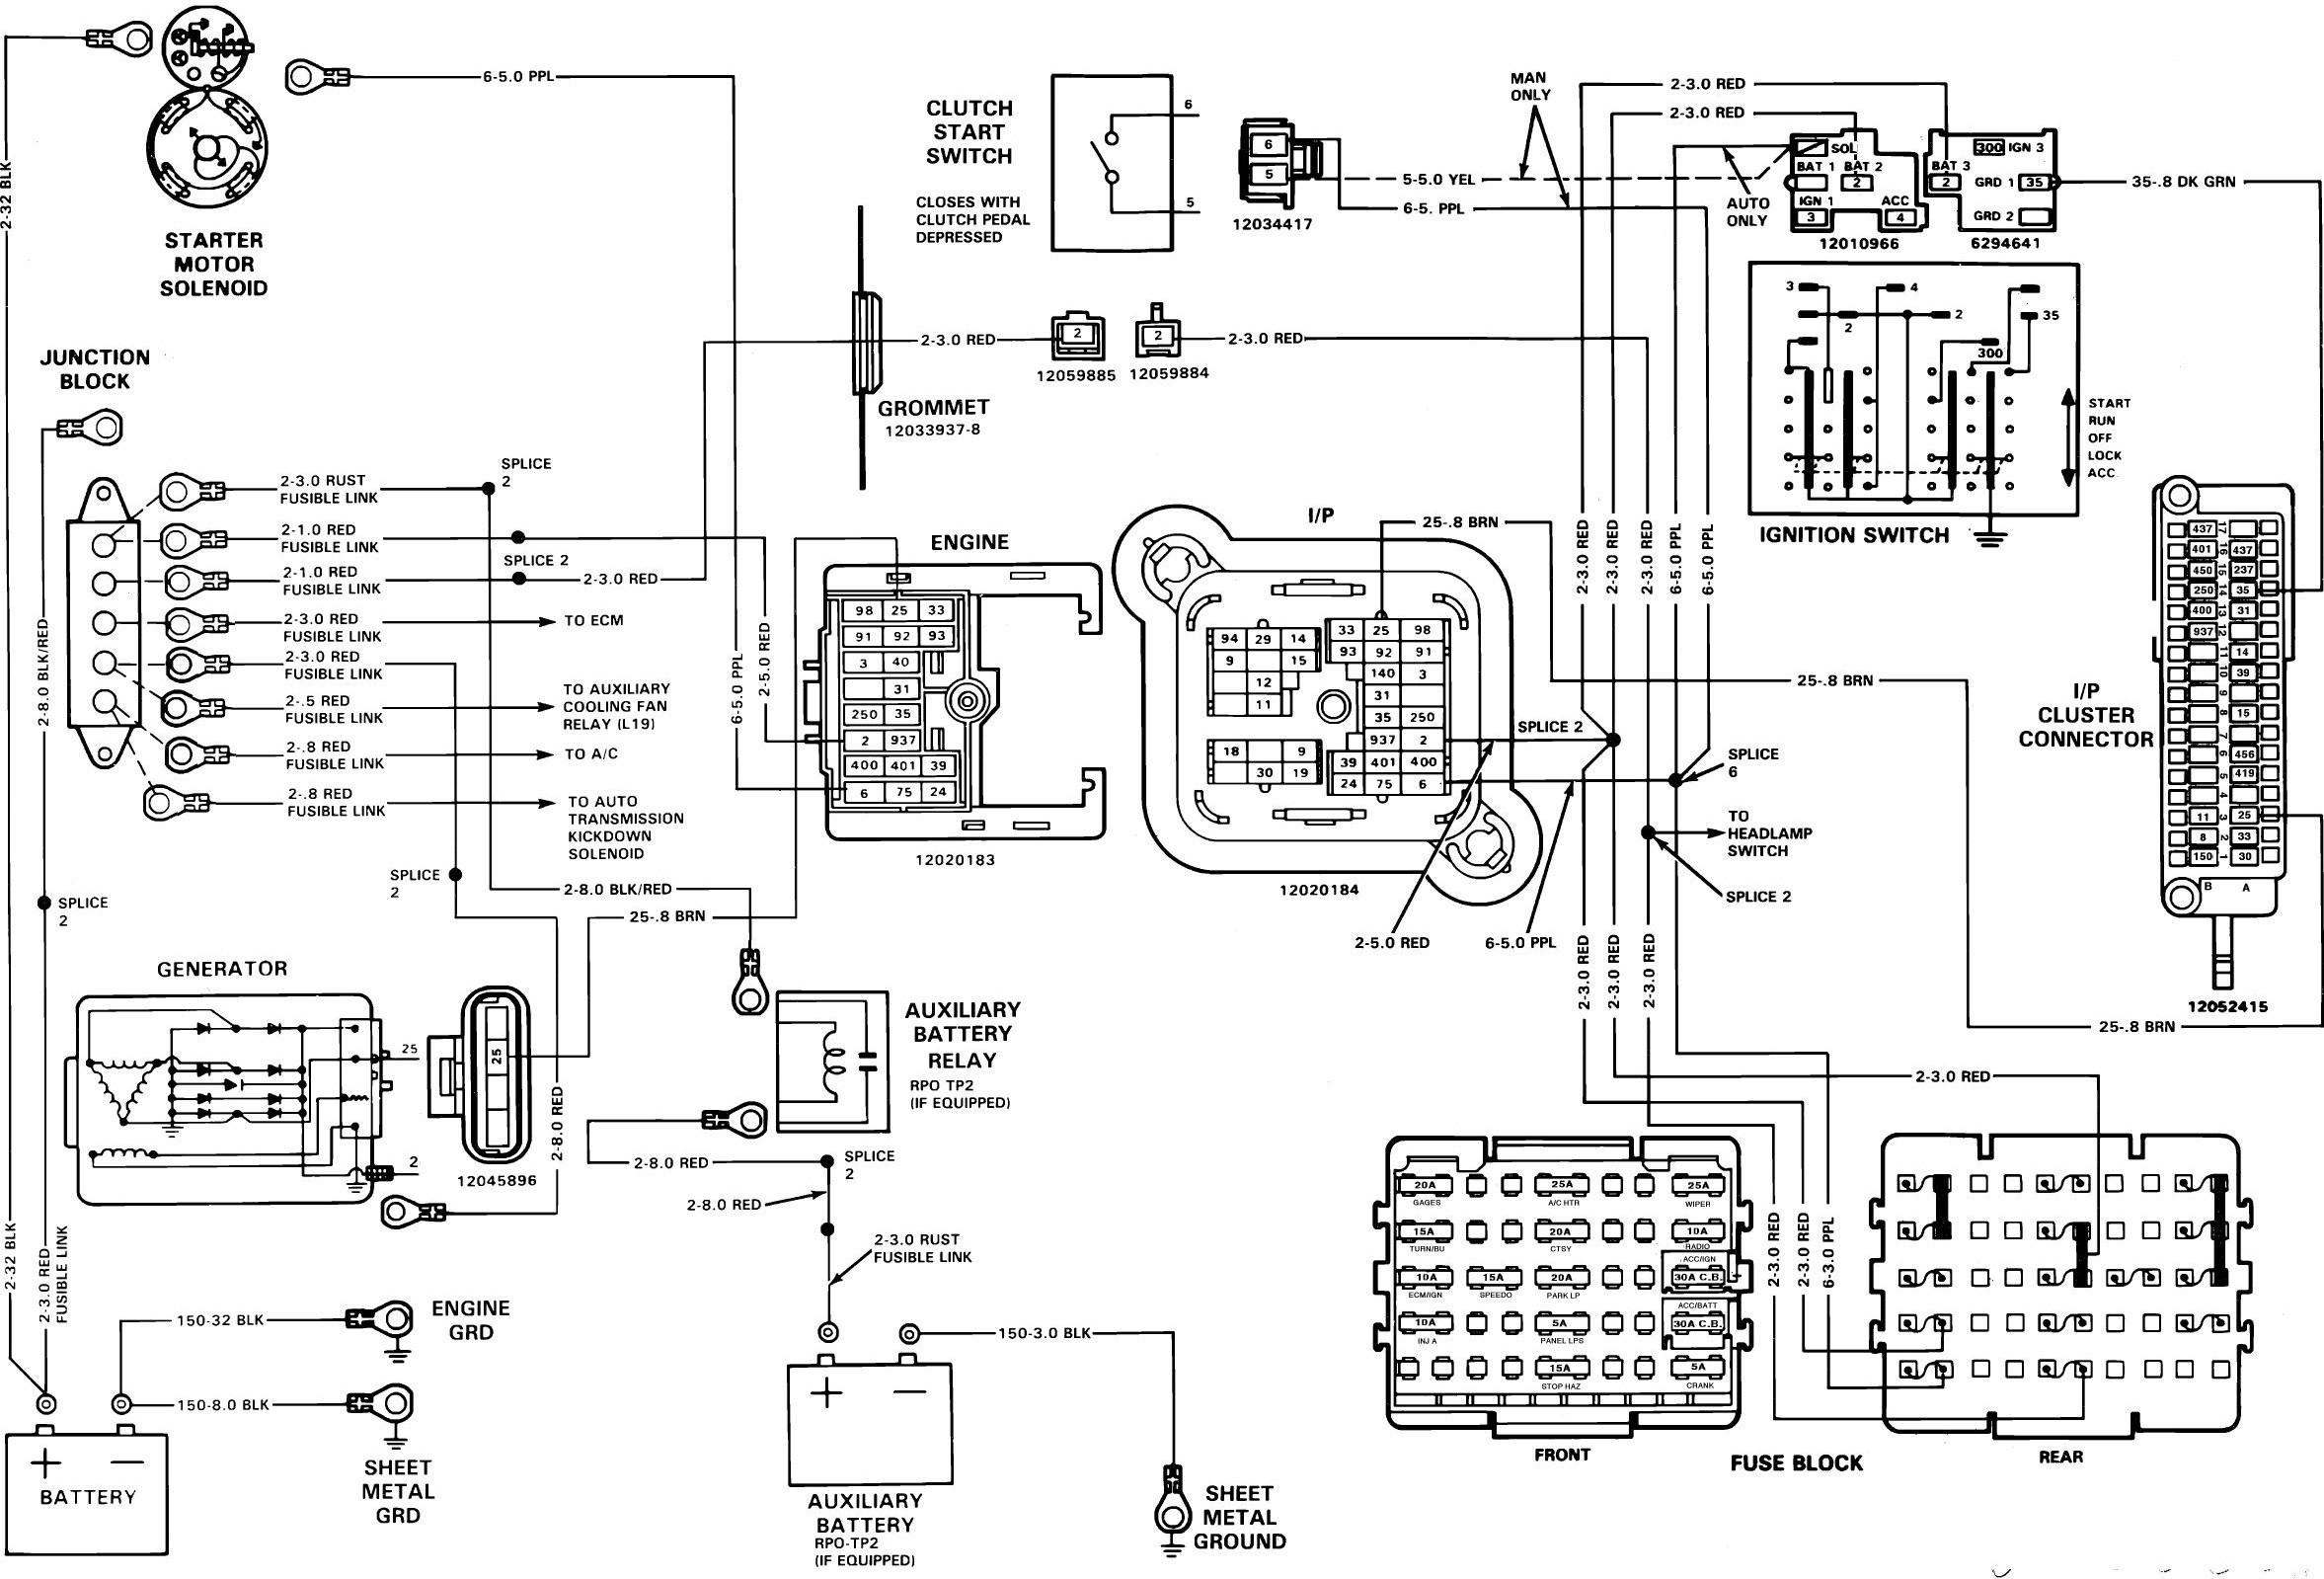 wiring diagram 89 chevy truck